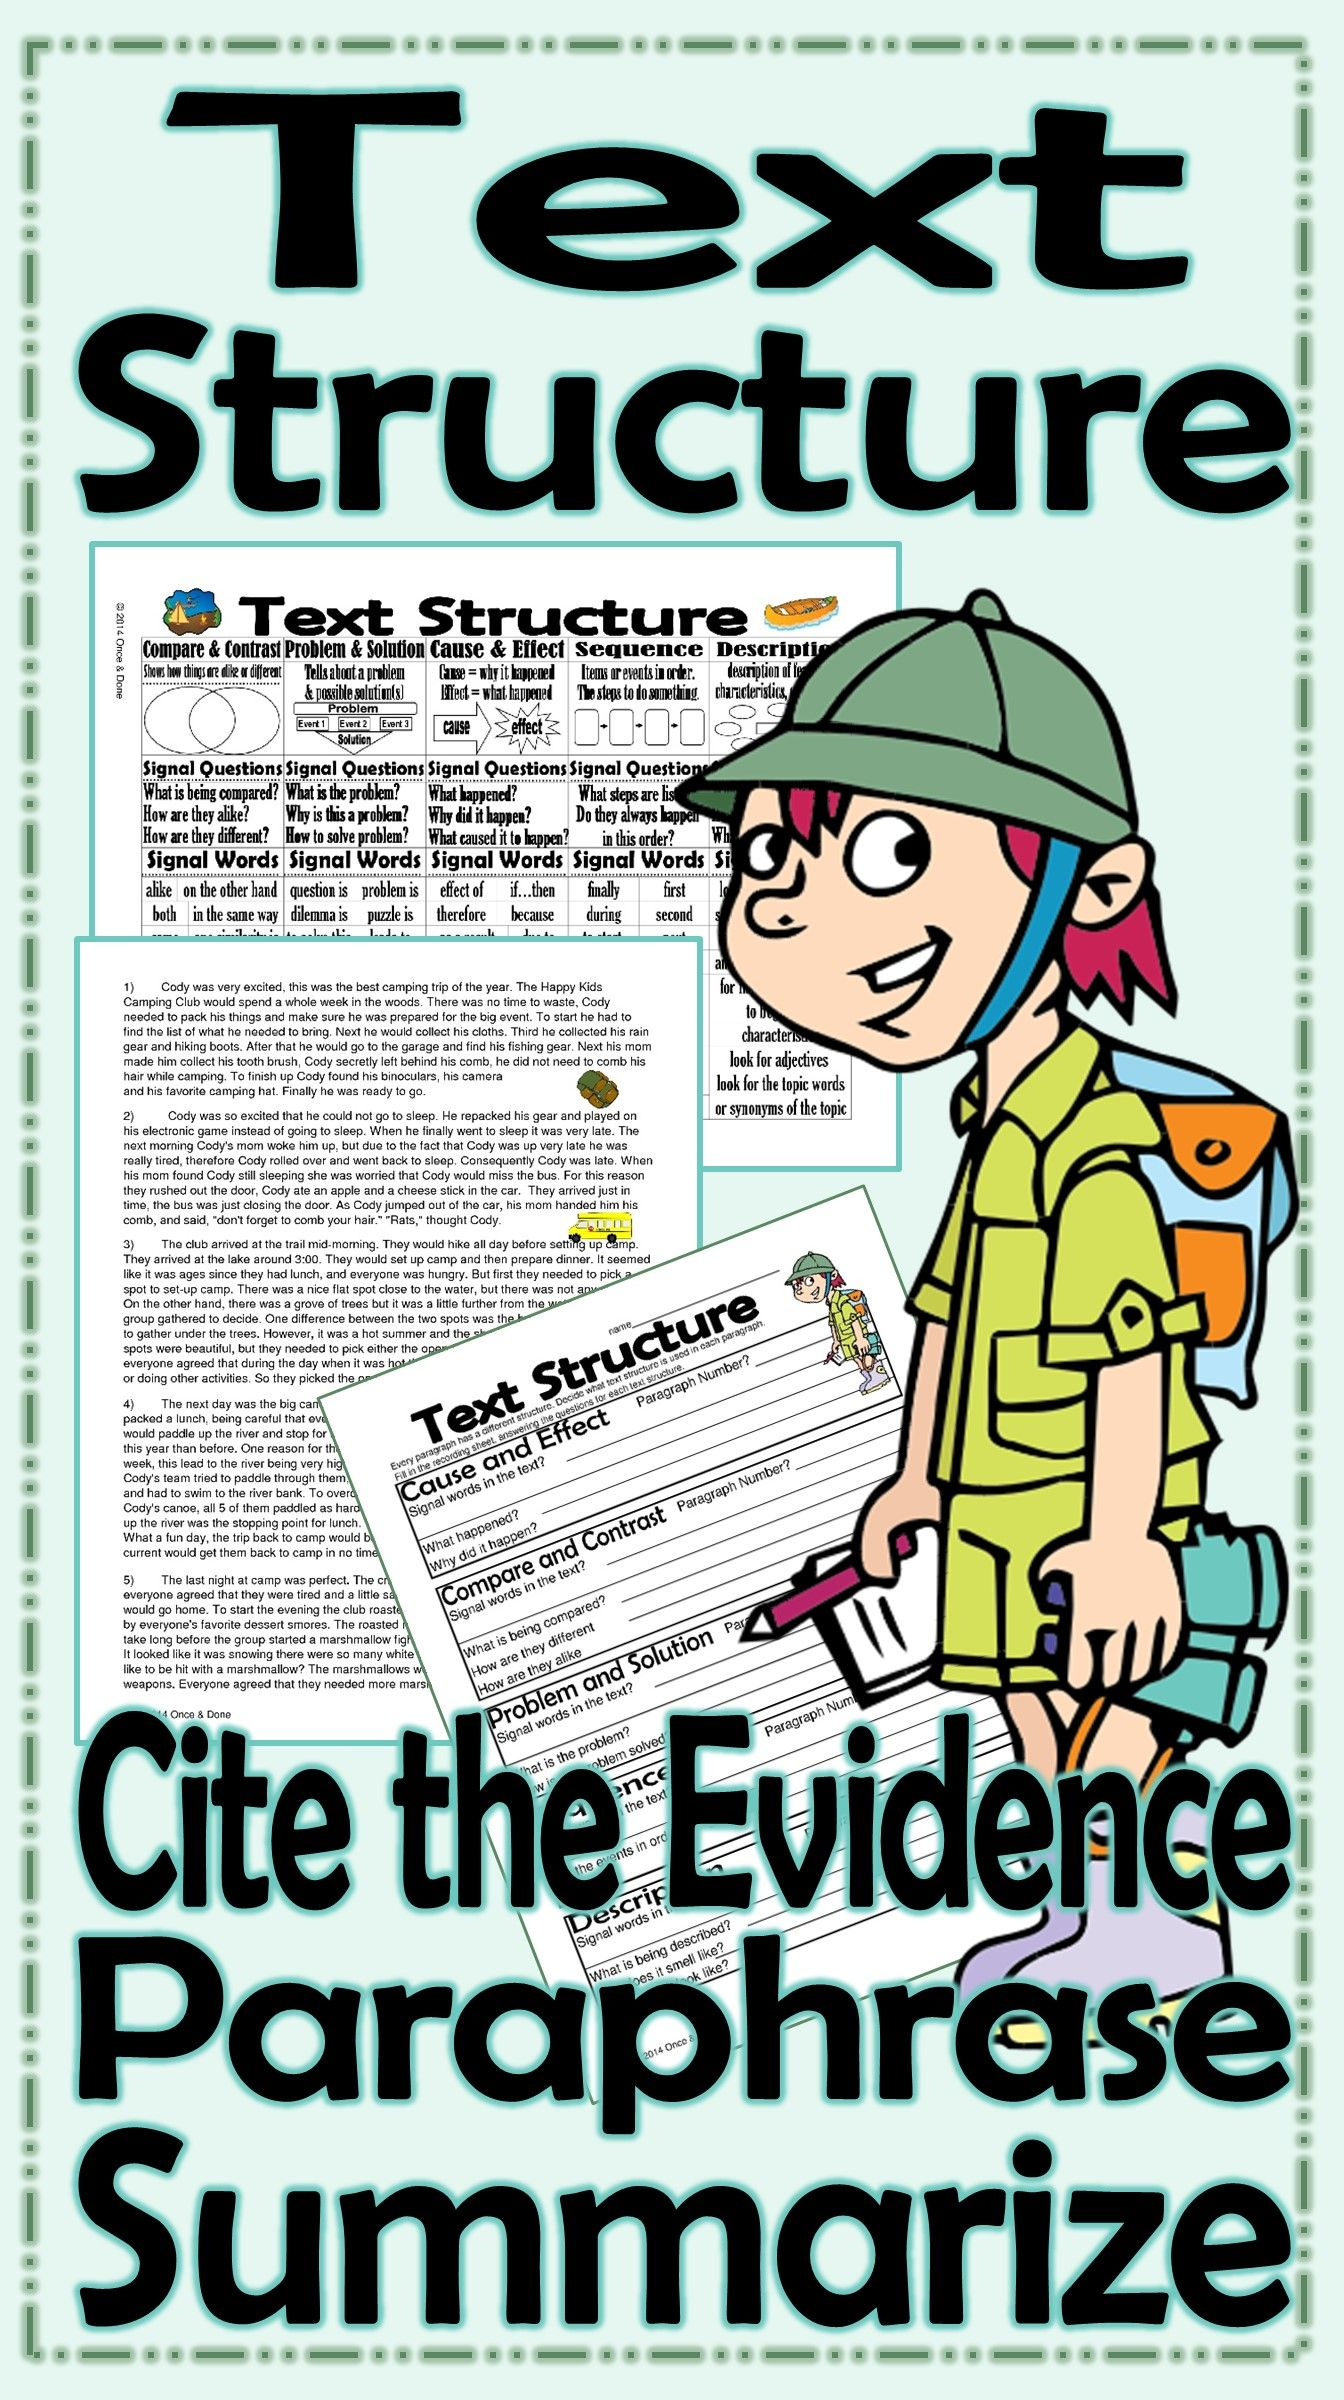 Text Structure Summarize Paraphrase Cite The Evidence